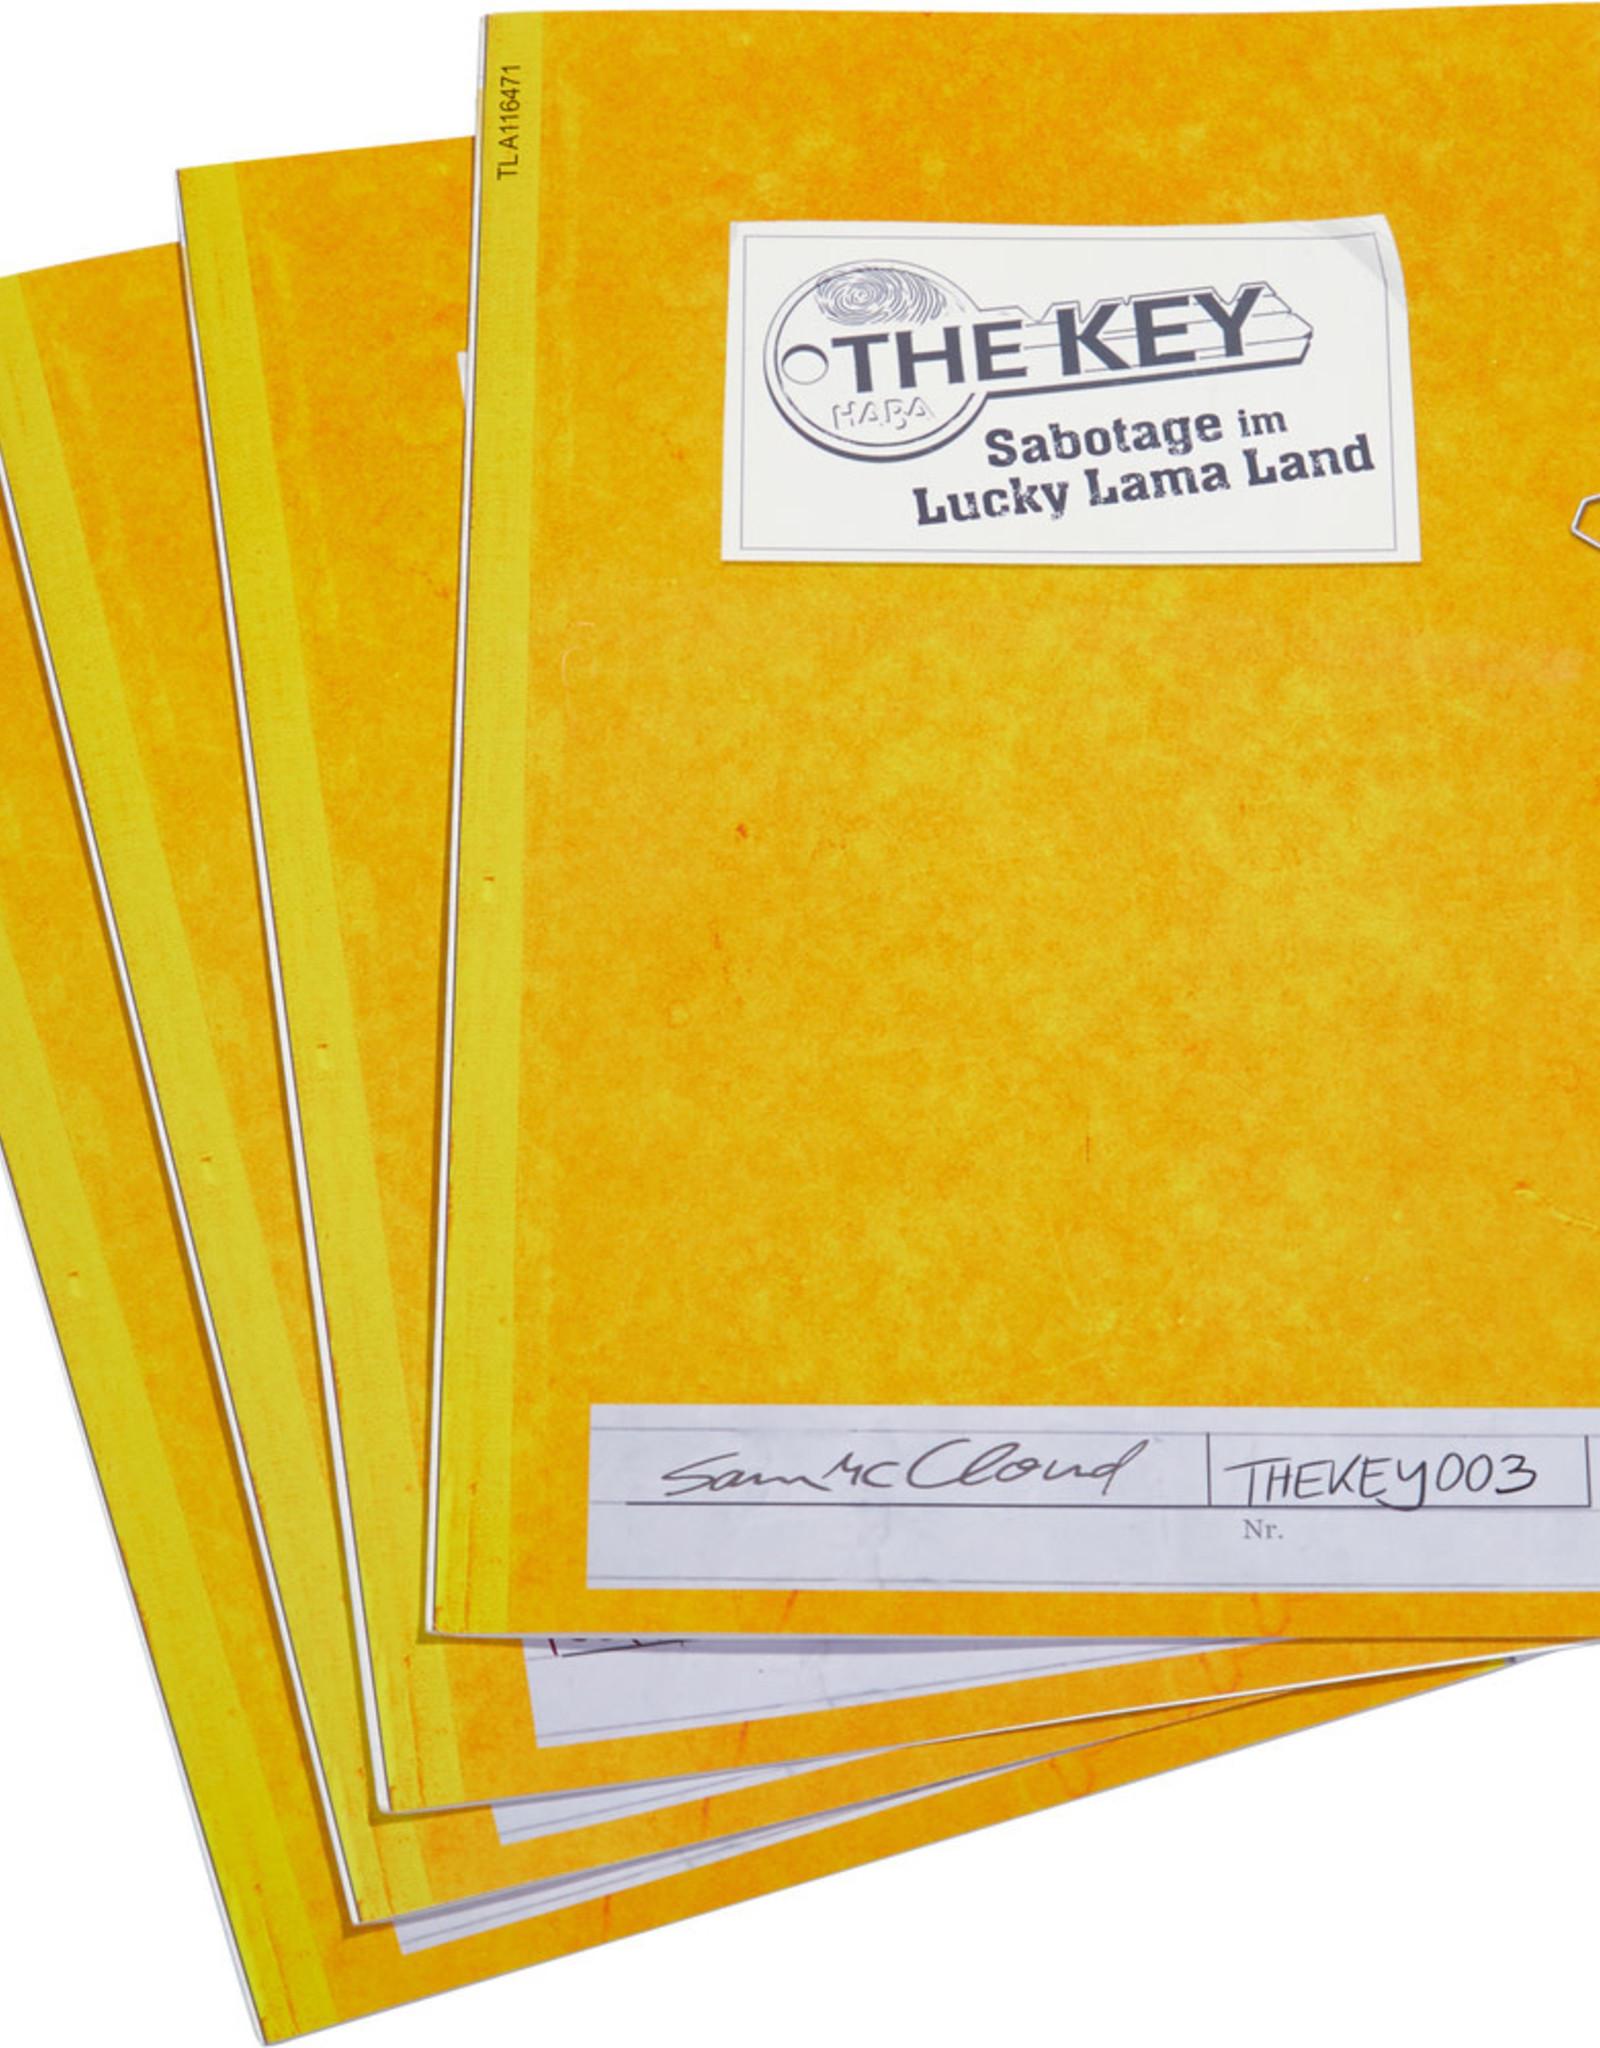 HABA The Key - Sabotage in Lucy Lama Land